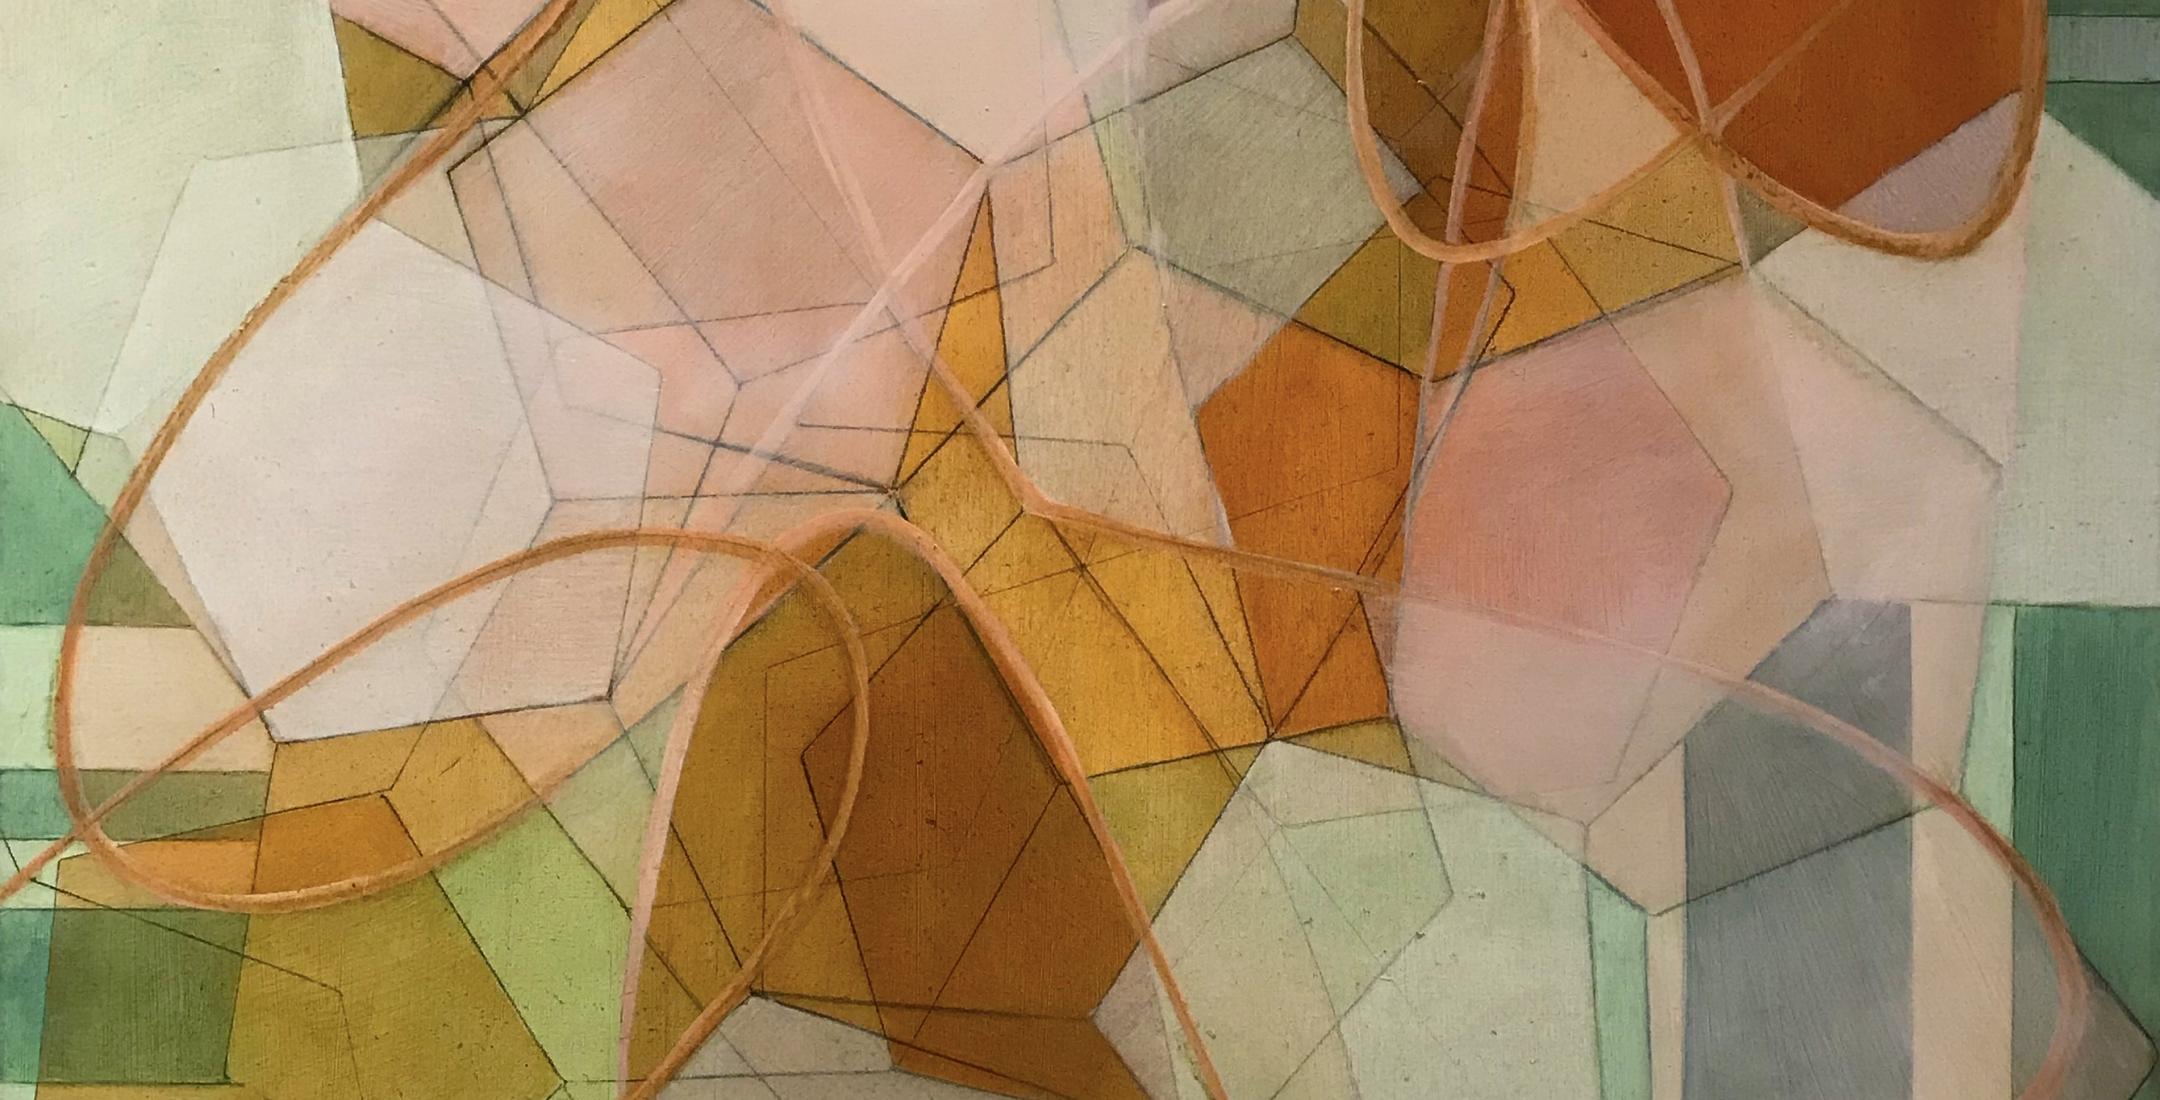 Mark Pomilio, Symbols & Symmetries IV